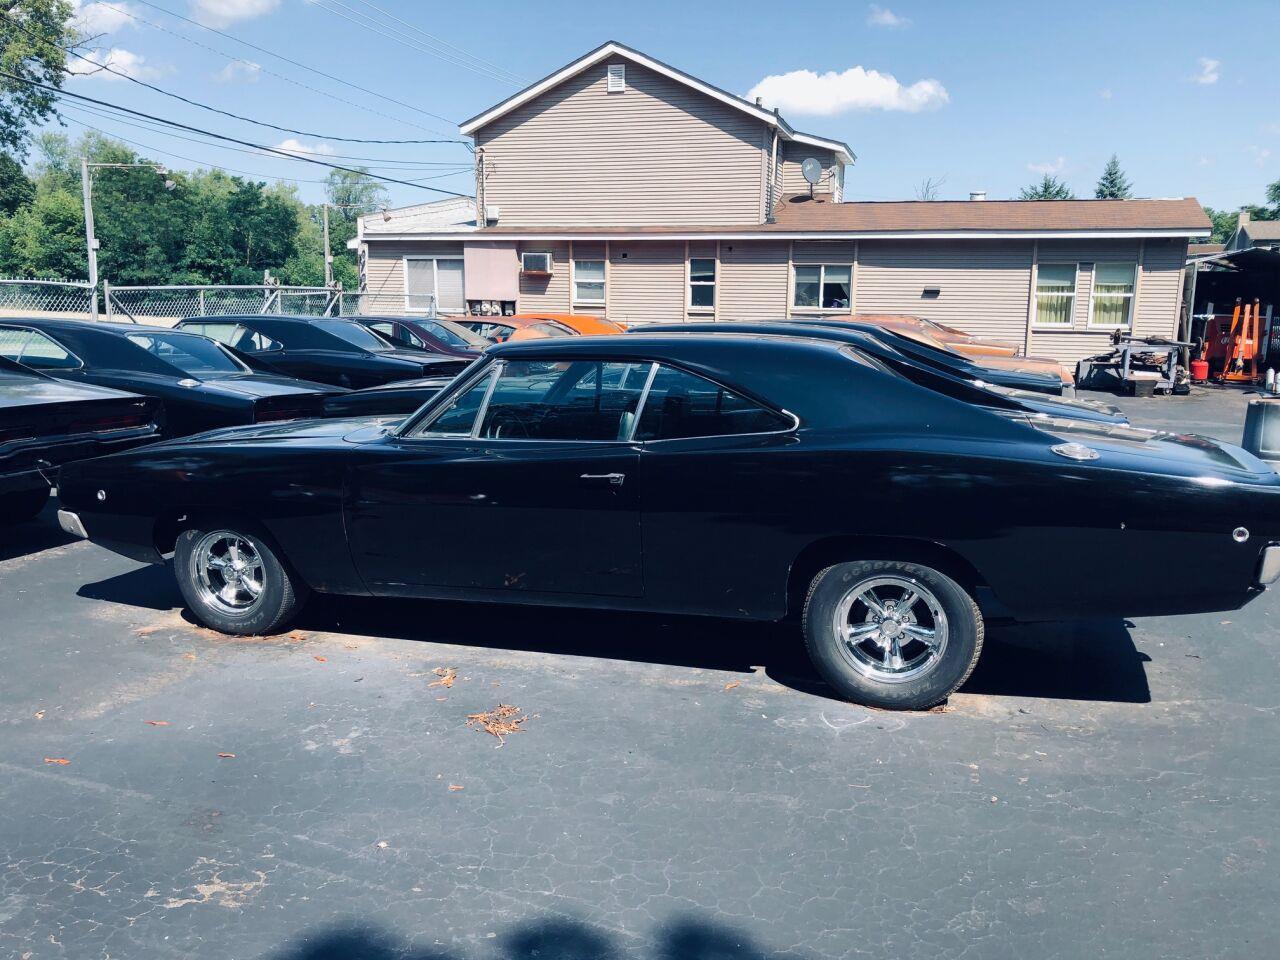 for sale 1968 dodge charger in san luis obispo, california cars - san luis obispo, ca at geebo